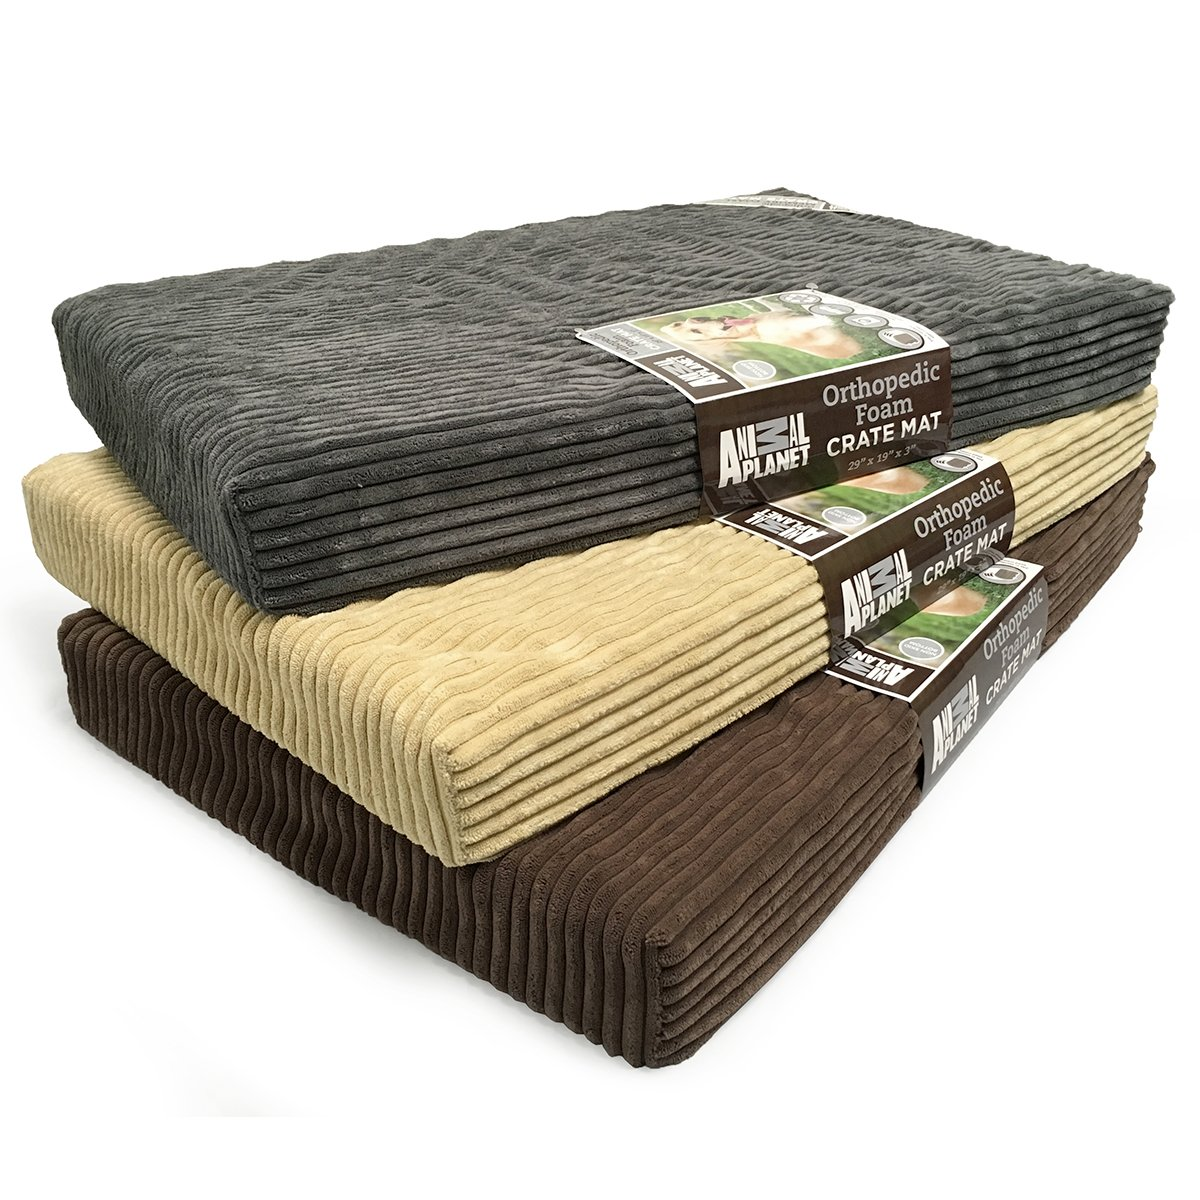 Animal Planet Orthopedic Pet Bed, 40''x26''x3'', Grey by Animal Planet (Image #4)